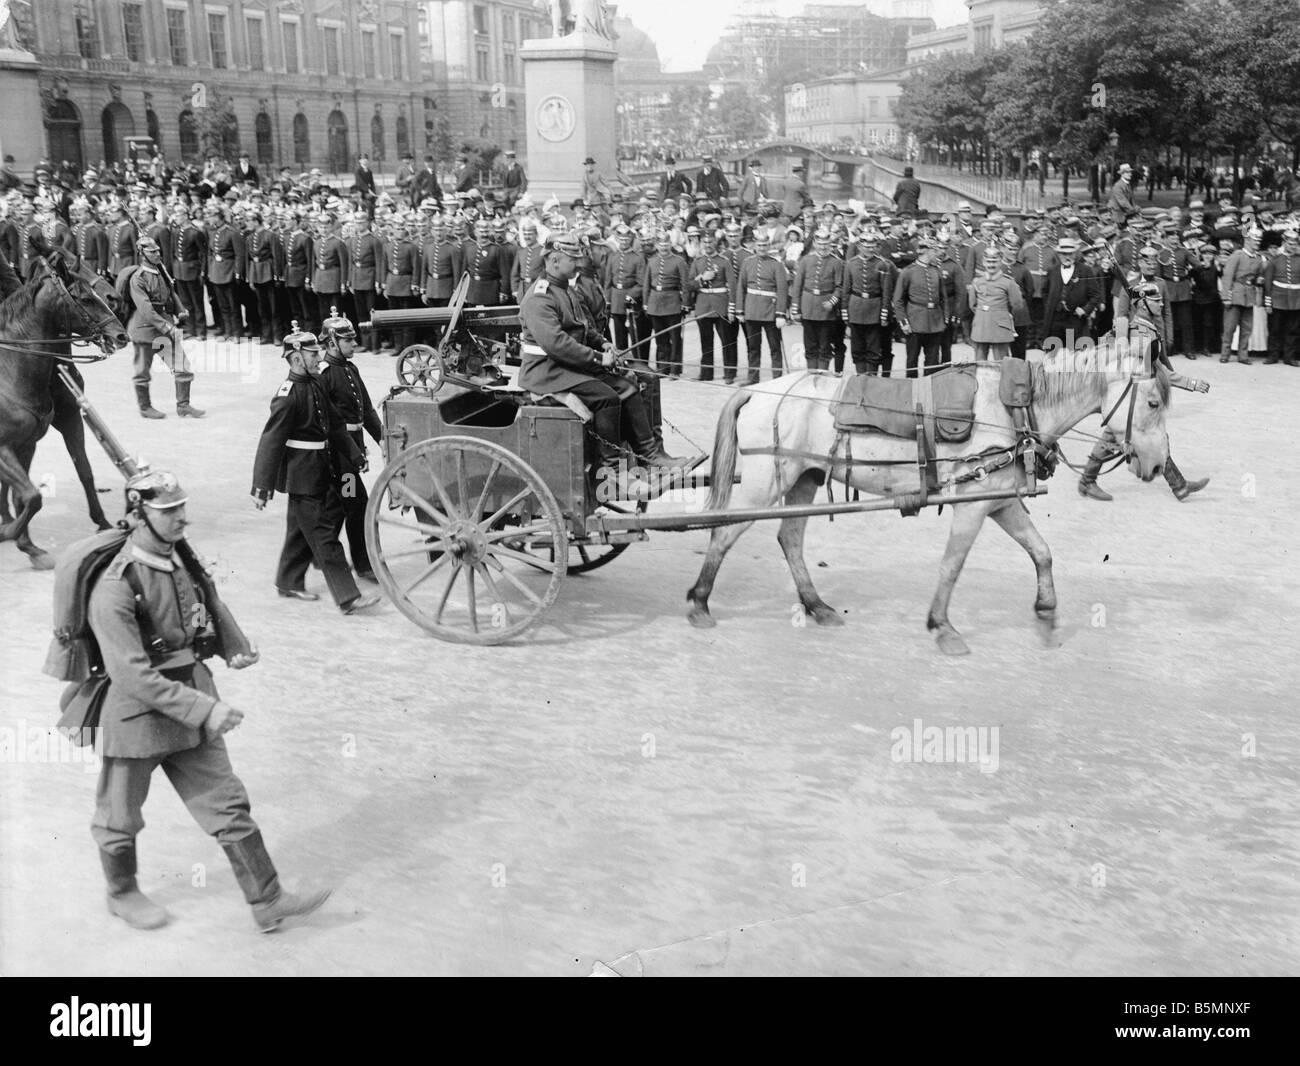 8 1914 9 2 A1 Russian cart gun Berlin 1914 World War I 1914 18 Berlin Troop parade with presentation of war trophies - Stock Image